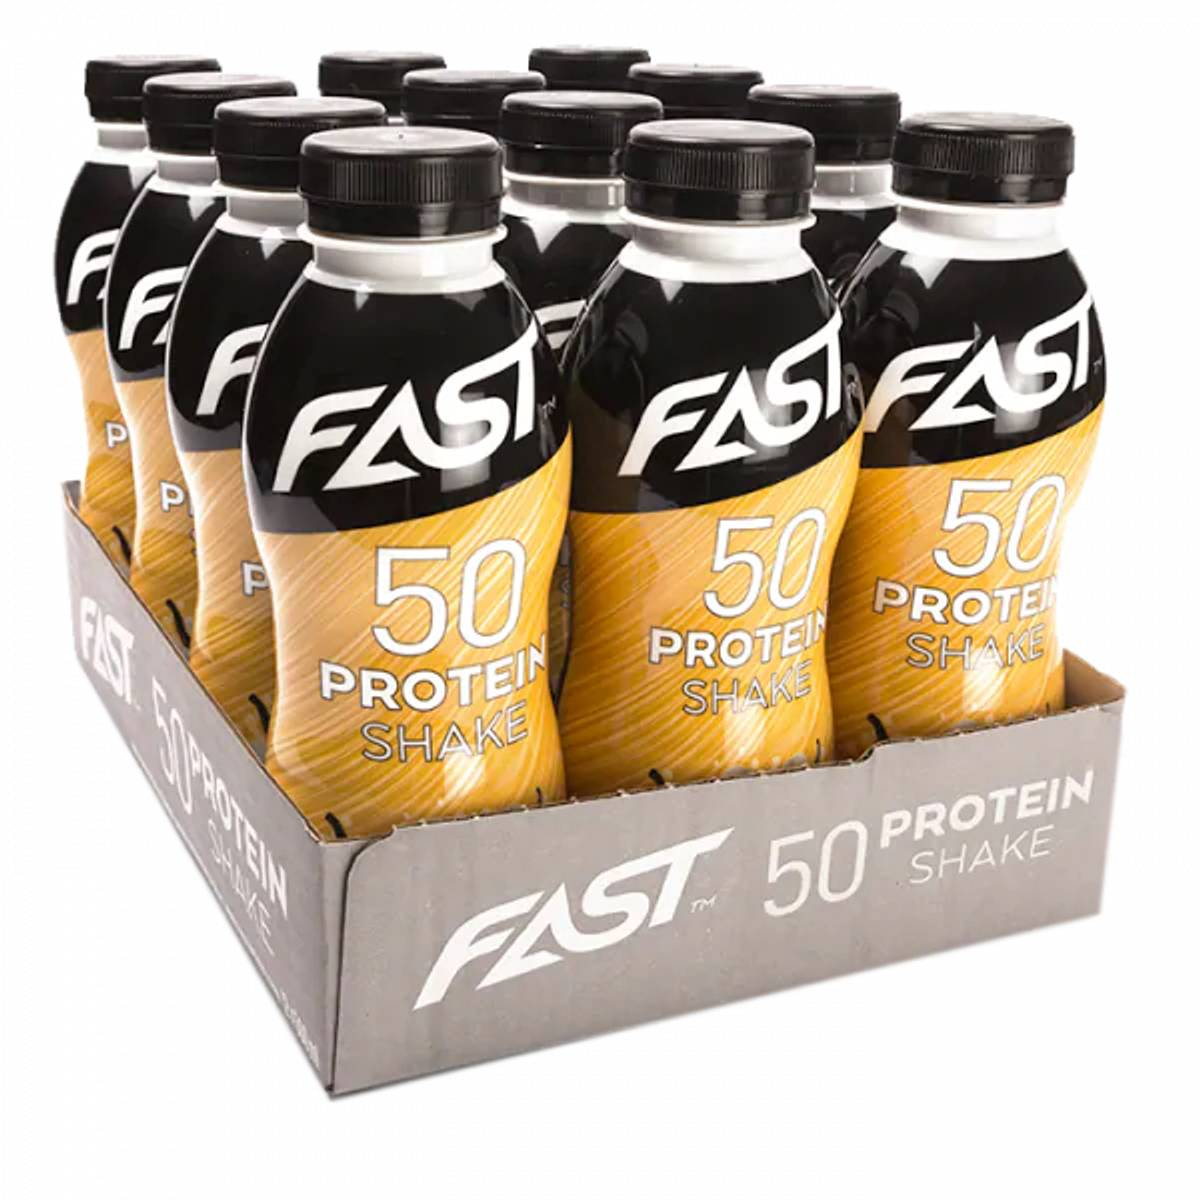 FAST Protein 50 shake - 500ml x 12stk - Vanilla